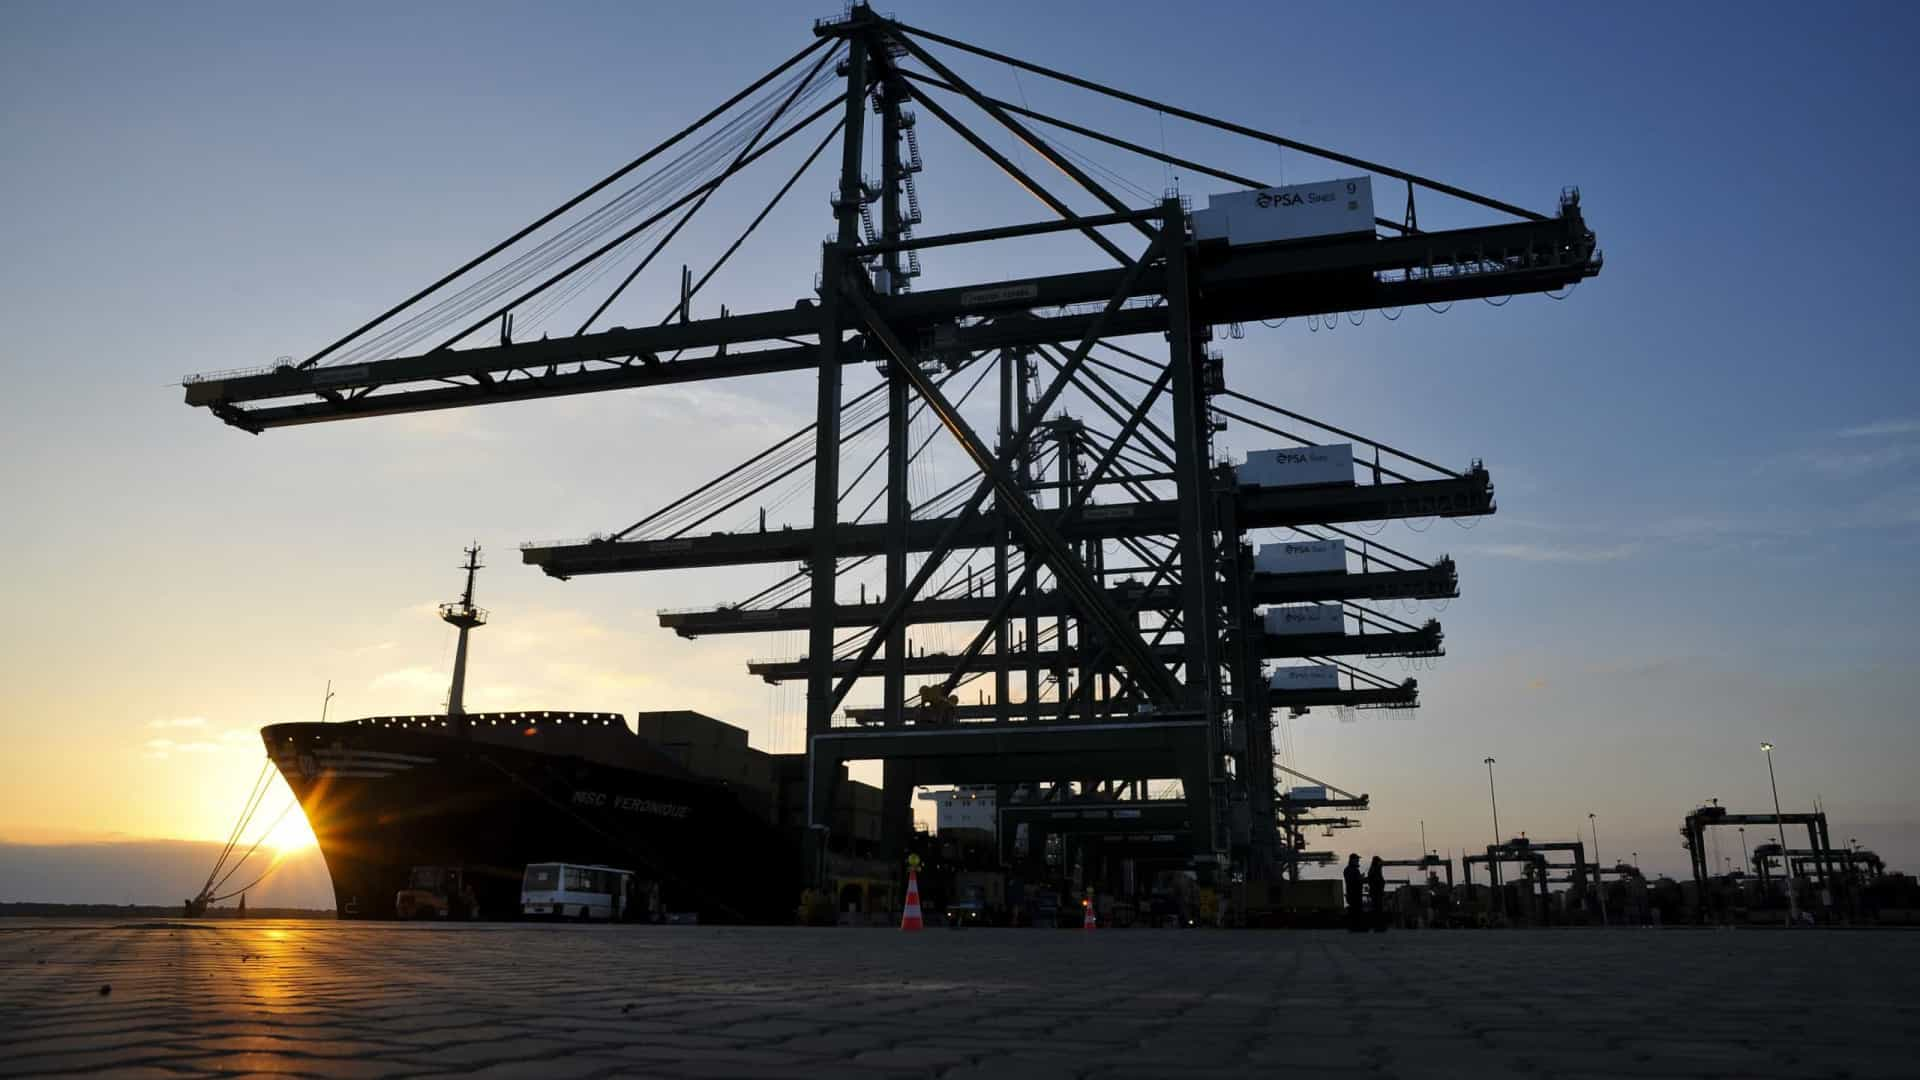 Carga nos portos cai quase 11%. Sines lidera recuo